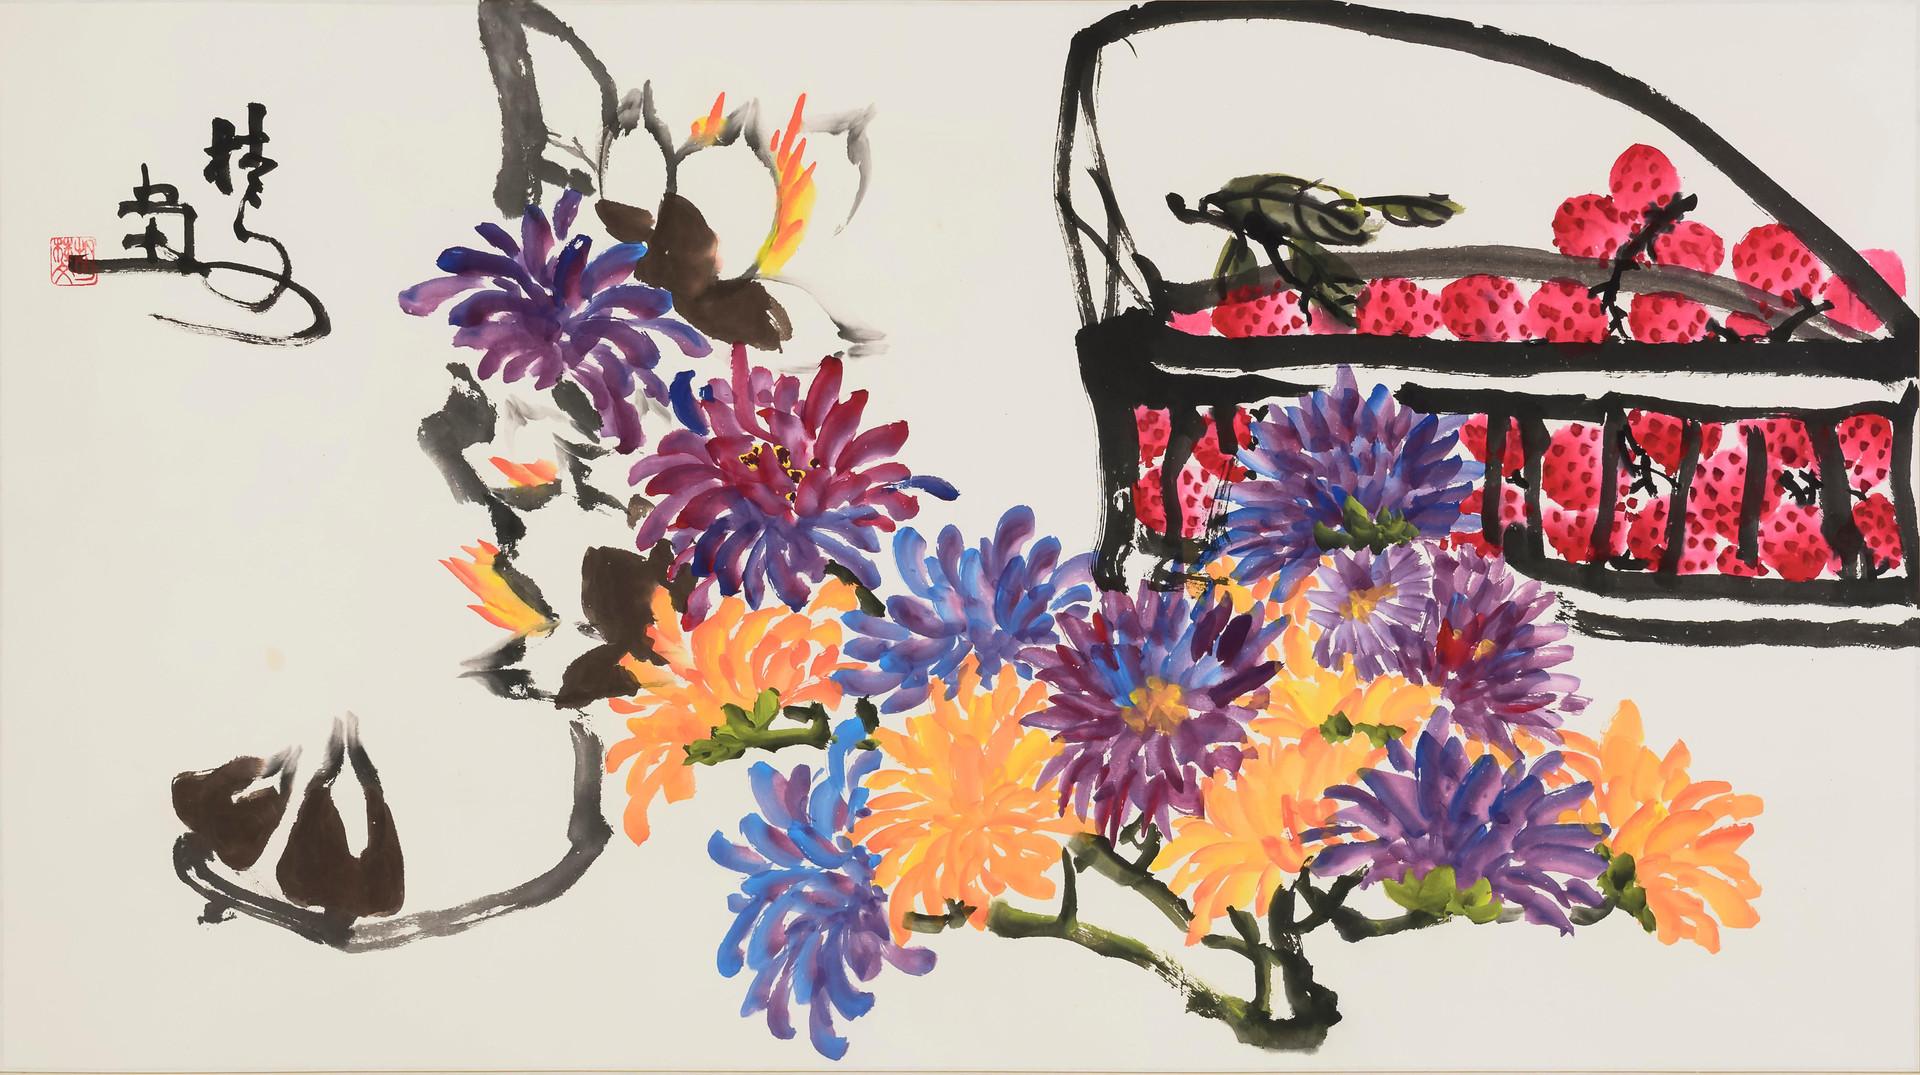 花果圖 Flowers & Fruits 138 x 70 cm